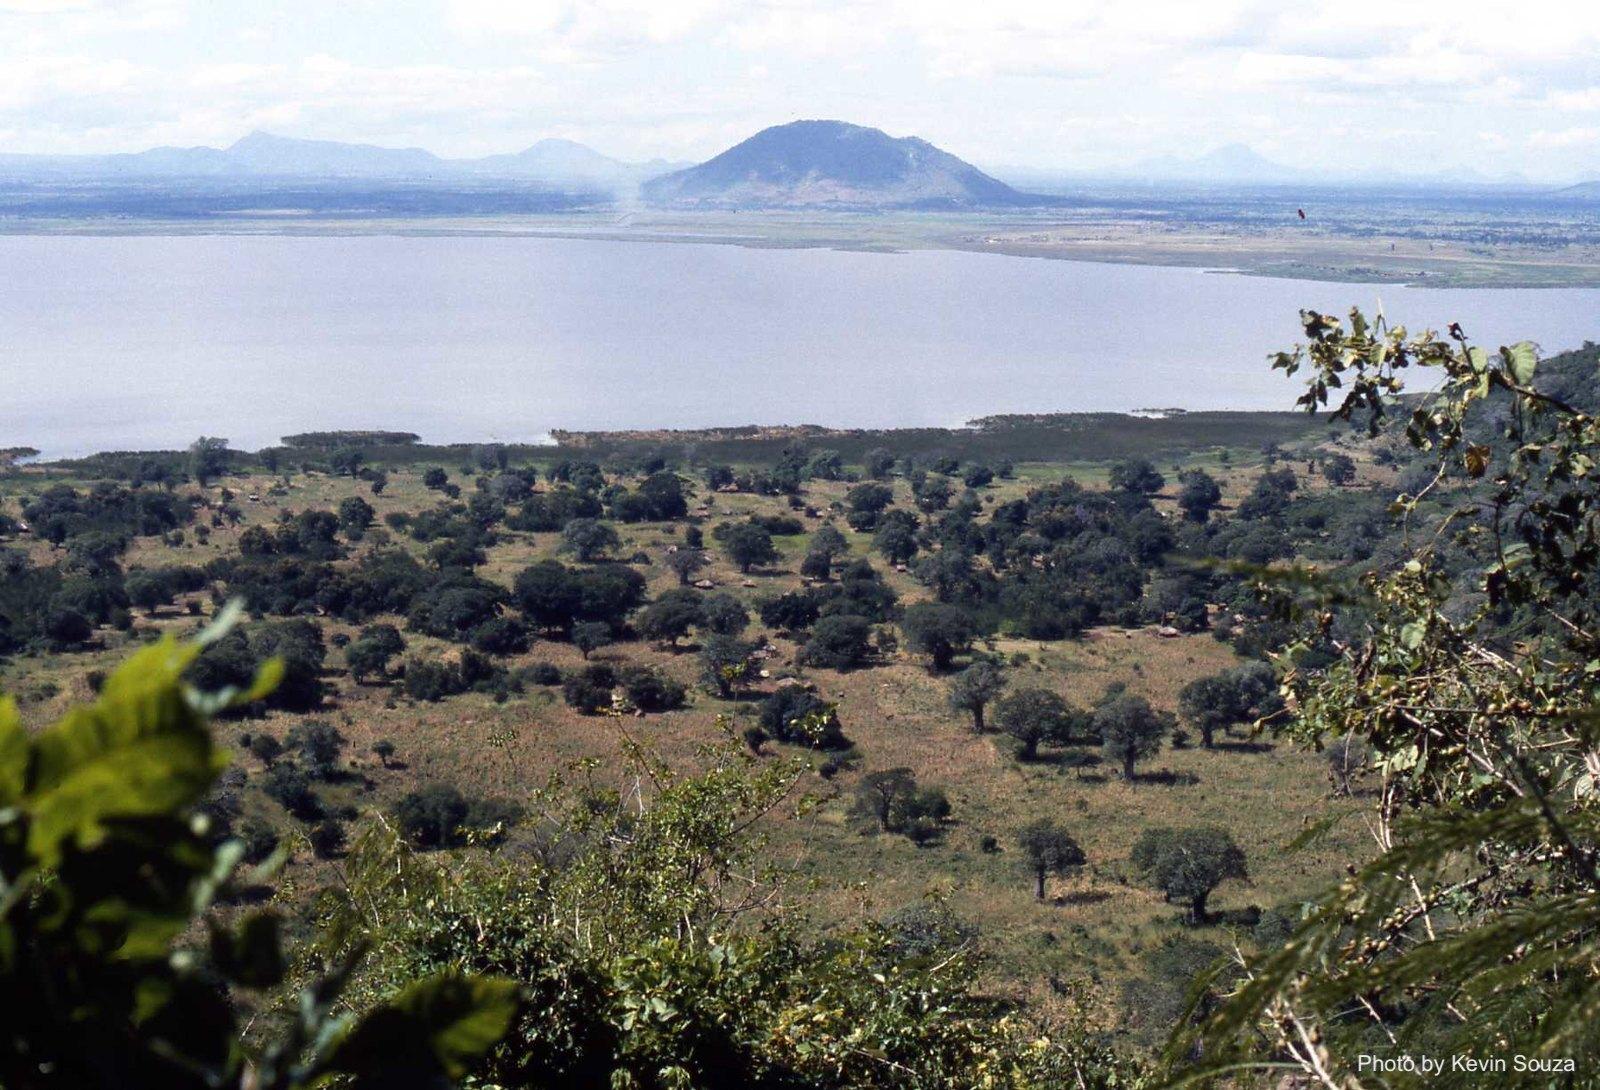 3_Lake Chilwa By Kevin Souza